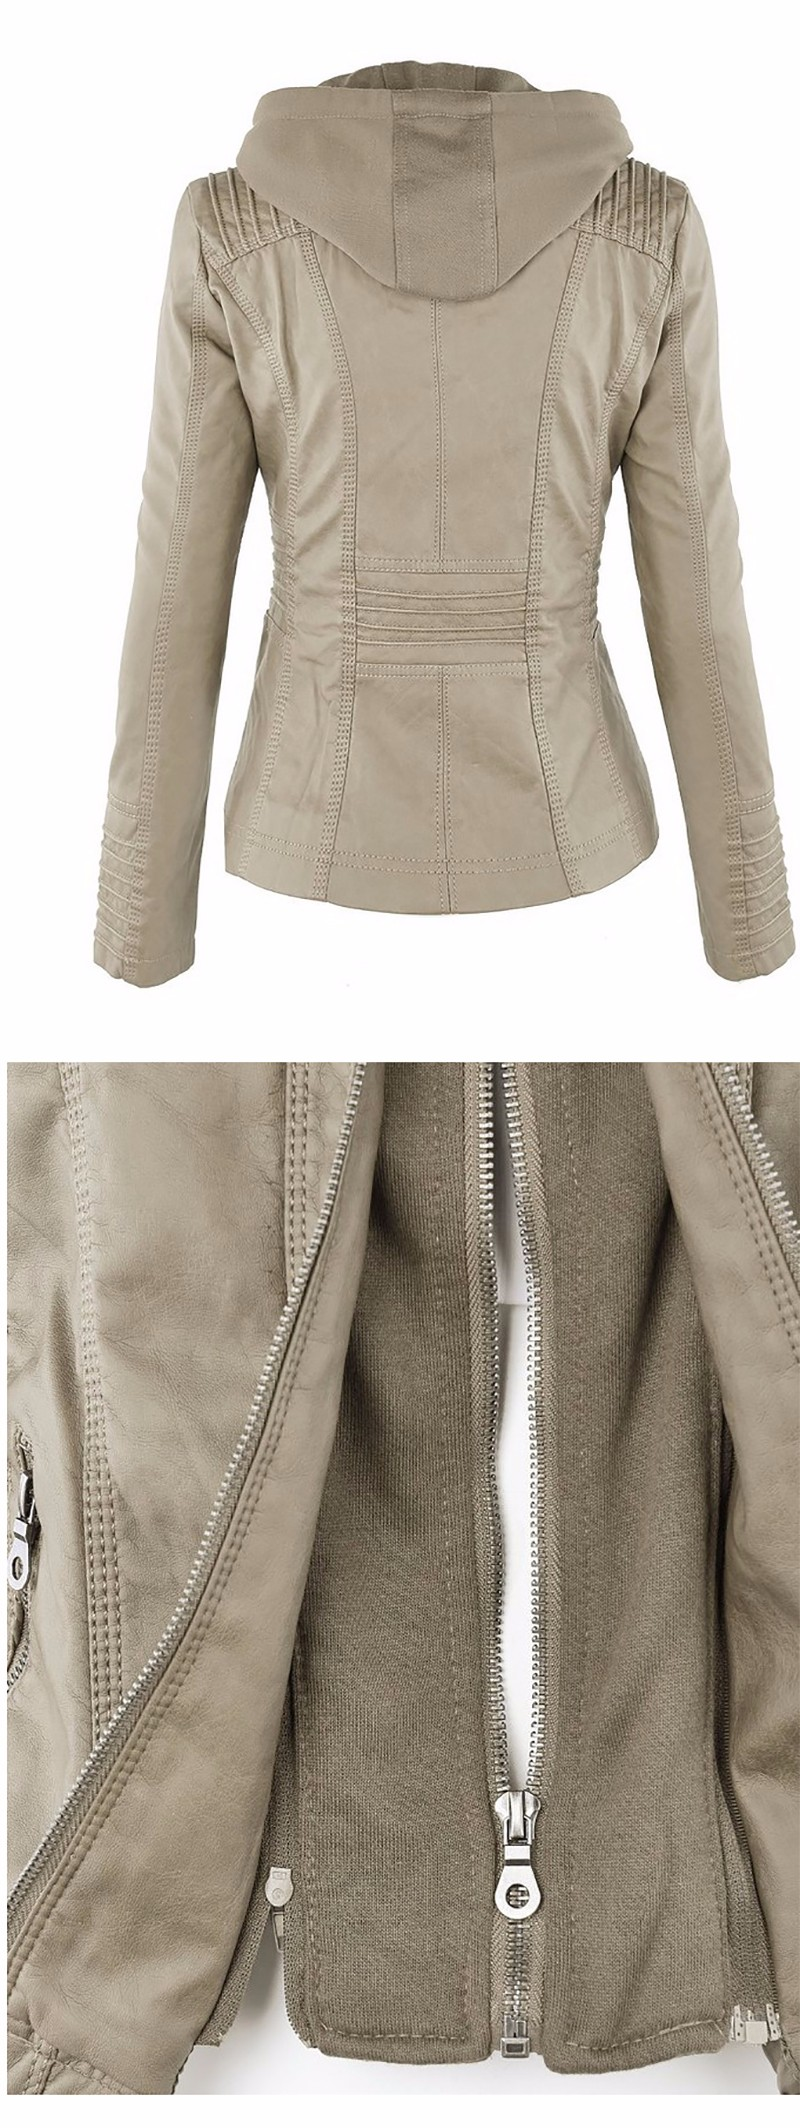 18 Winter Faux Leather Jacket Women Casual Basic Coats Plus Size 7XL Ladies Basic Jackets Waterproof Windproof Coats Female 50 6